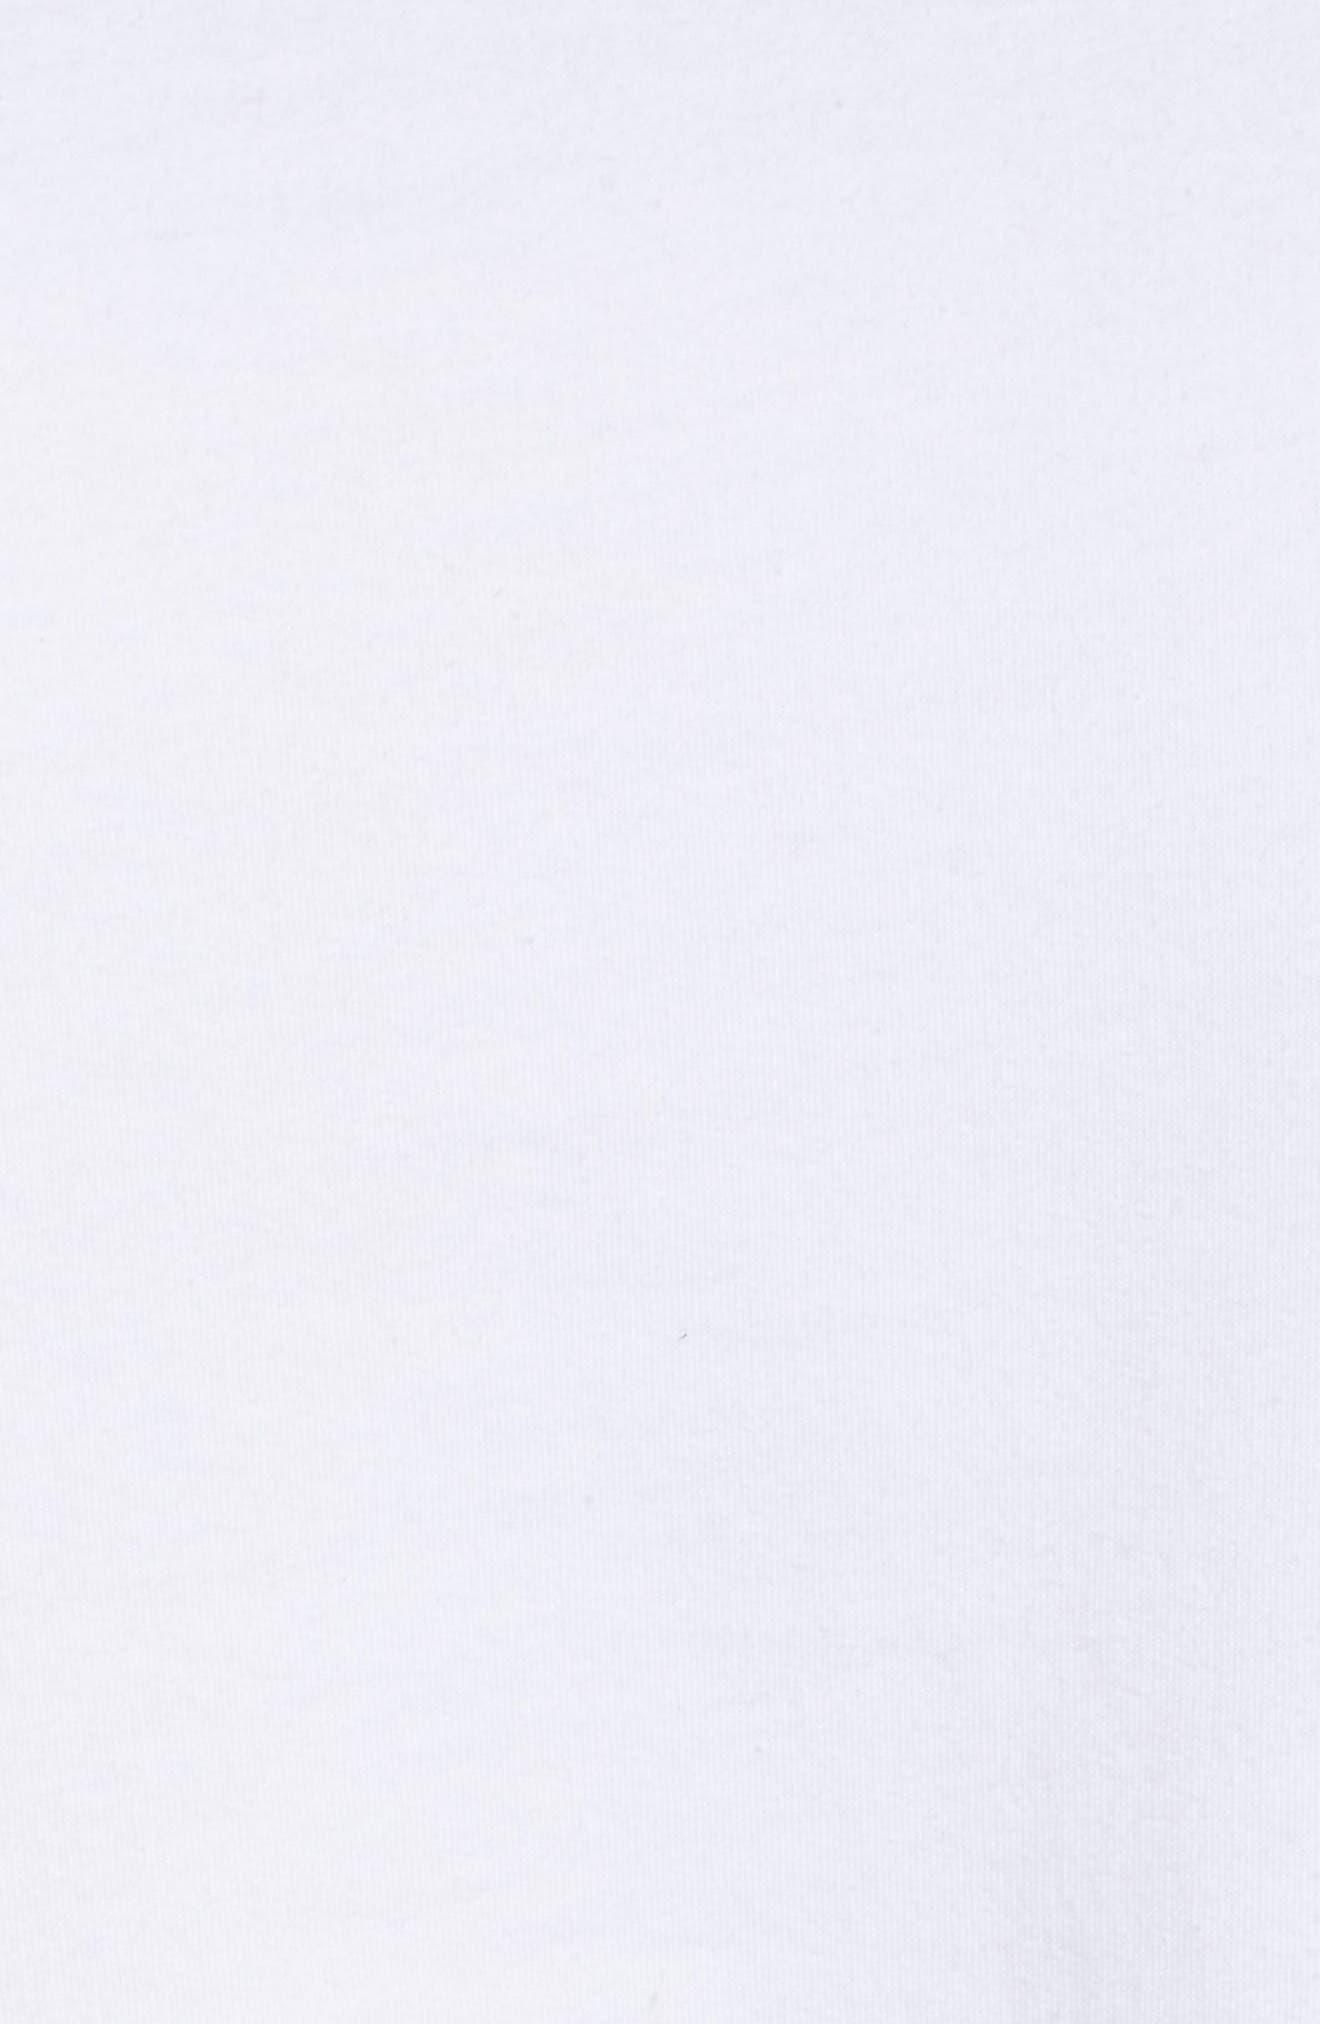 Lordes Fuzzy Fleece Sweatshirt,                             Alternate thumbnail 5, color,                             100